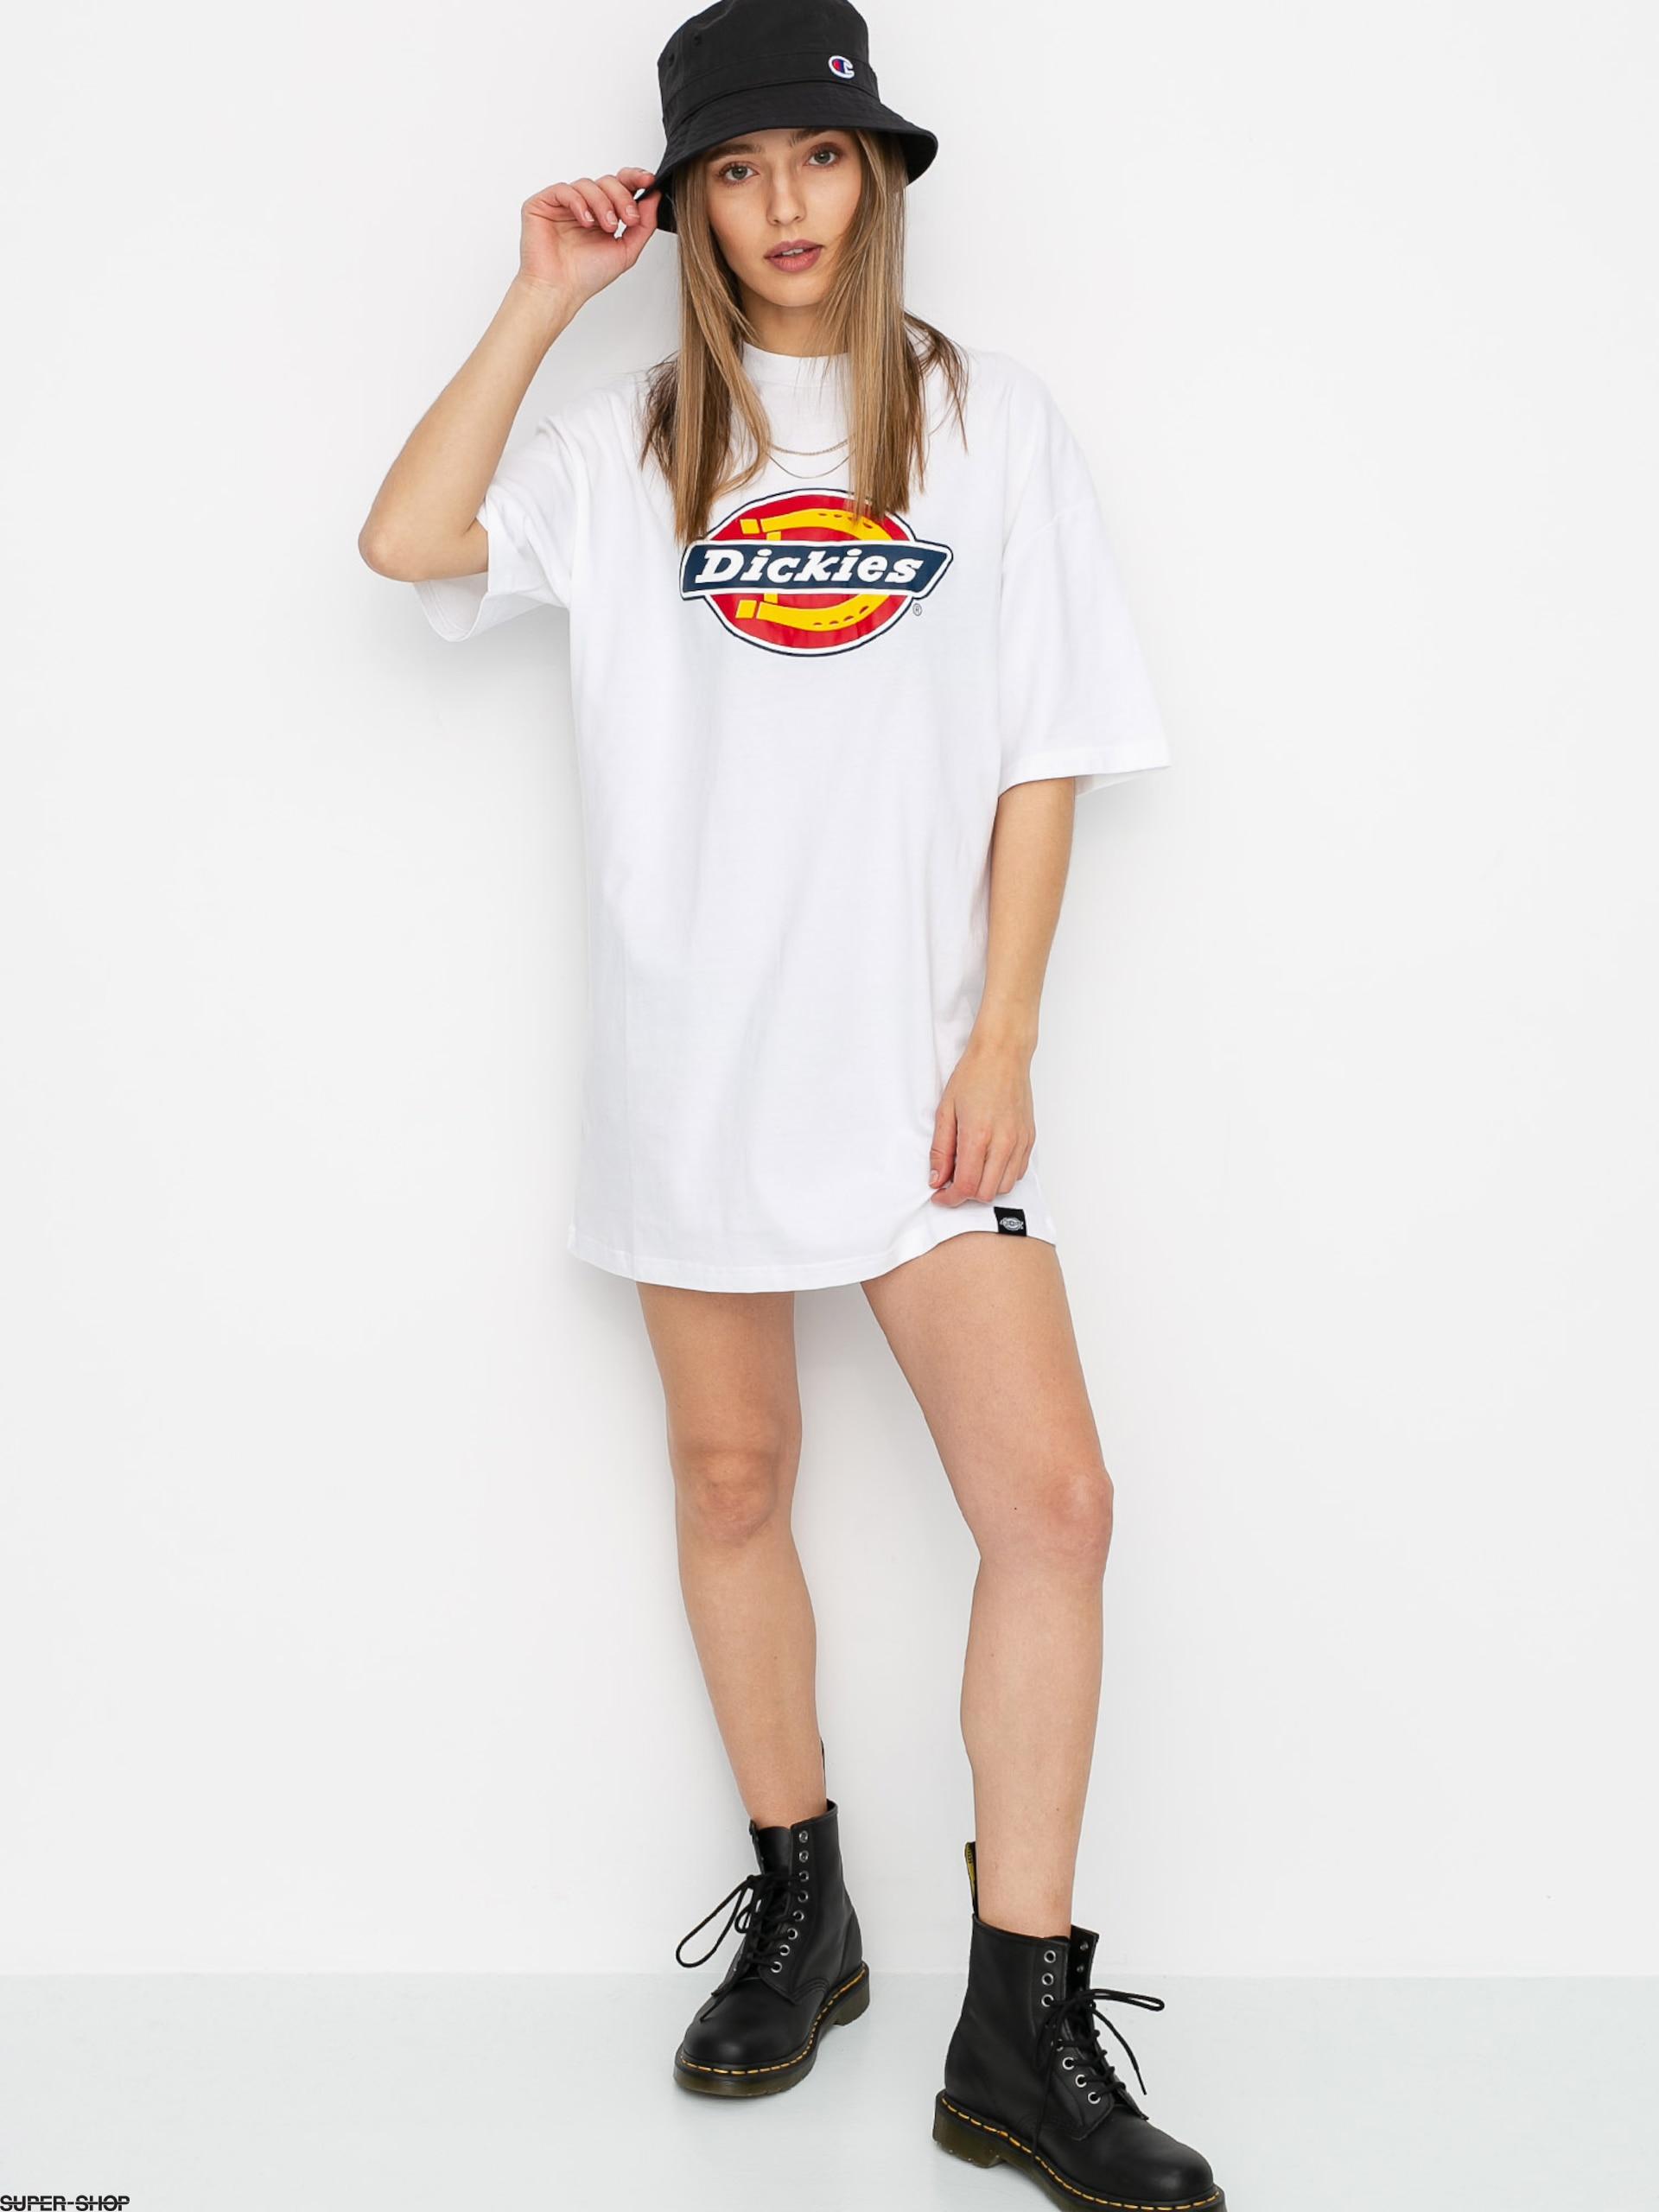 20+ Dickies Dress  Images